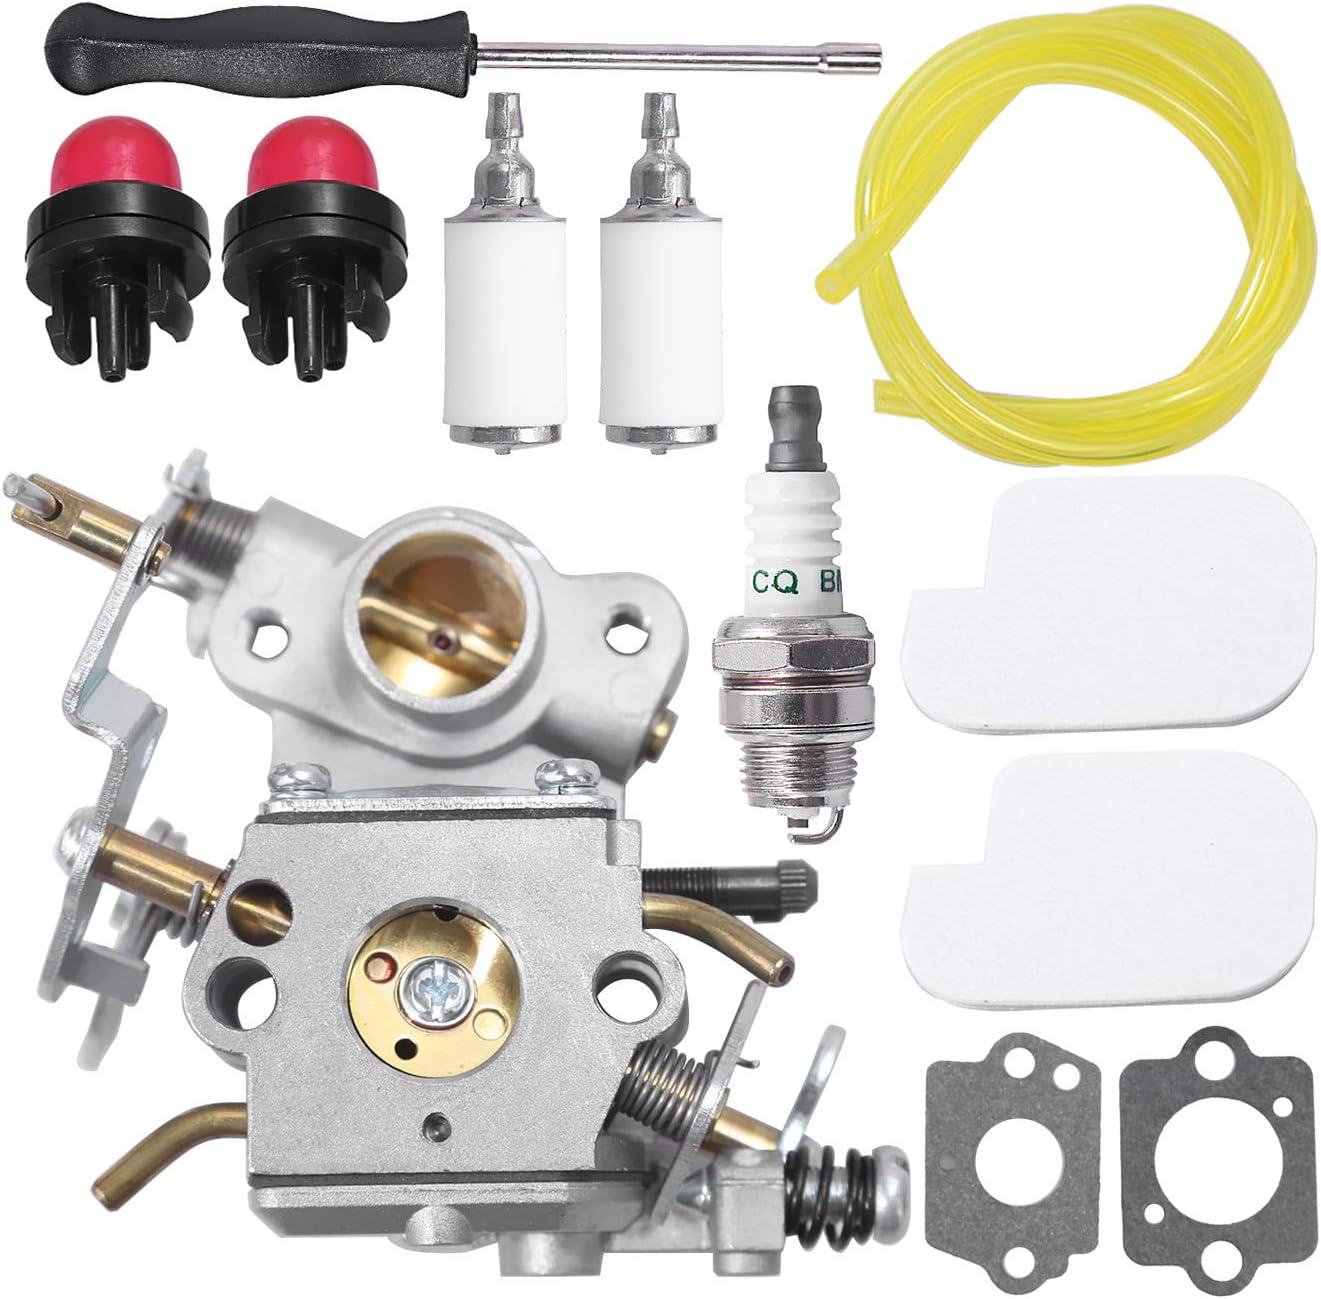 C1M-W26C Carburetor 545070601 for Poulan Pro PP3416 PP3516 PP3816 PP4018 PP4218 PPB3416 SM4218AV Gas Chainsaw with Air Filter Spark Plug Adjustment Tool